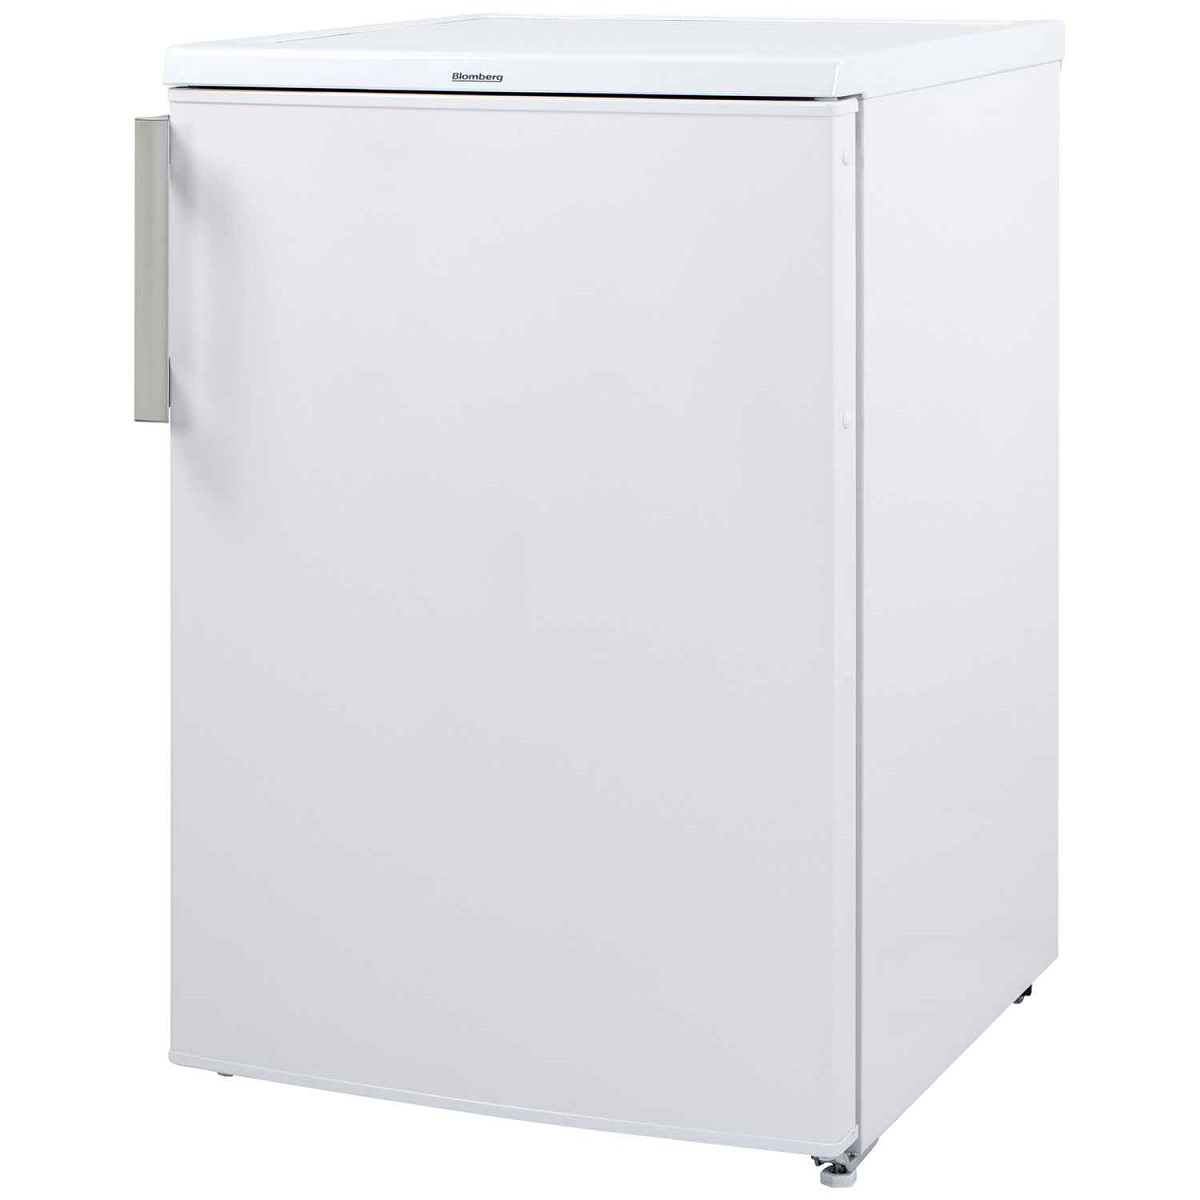 Image of Blomberg FNE1531P Undercounter Freezer